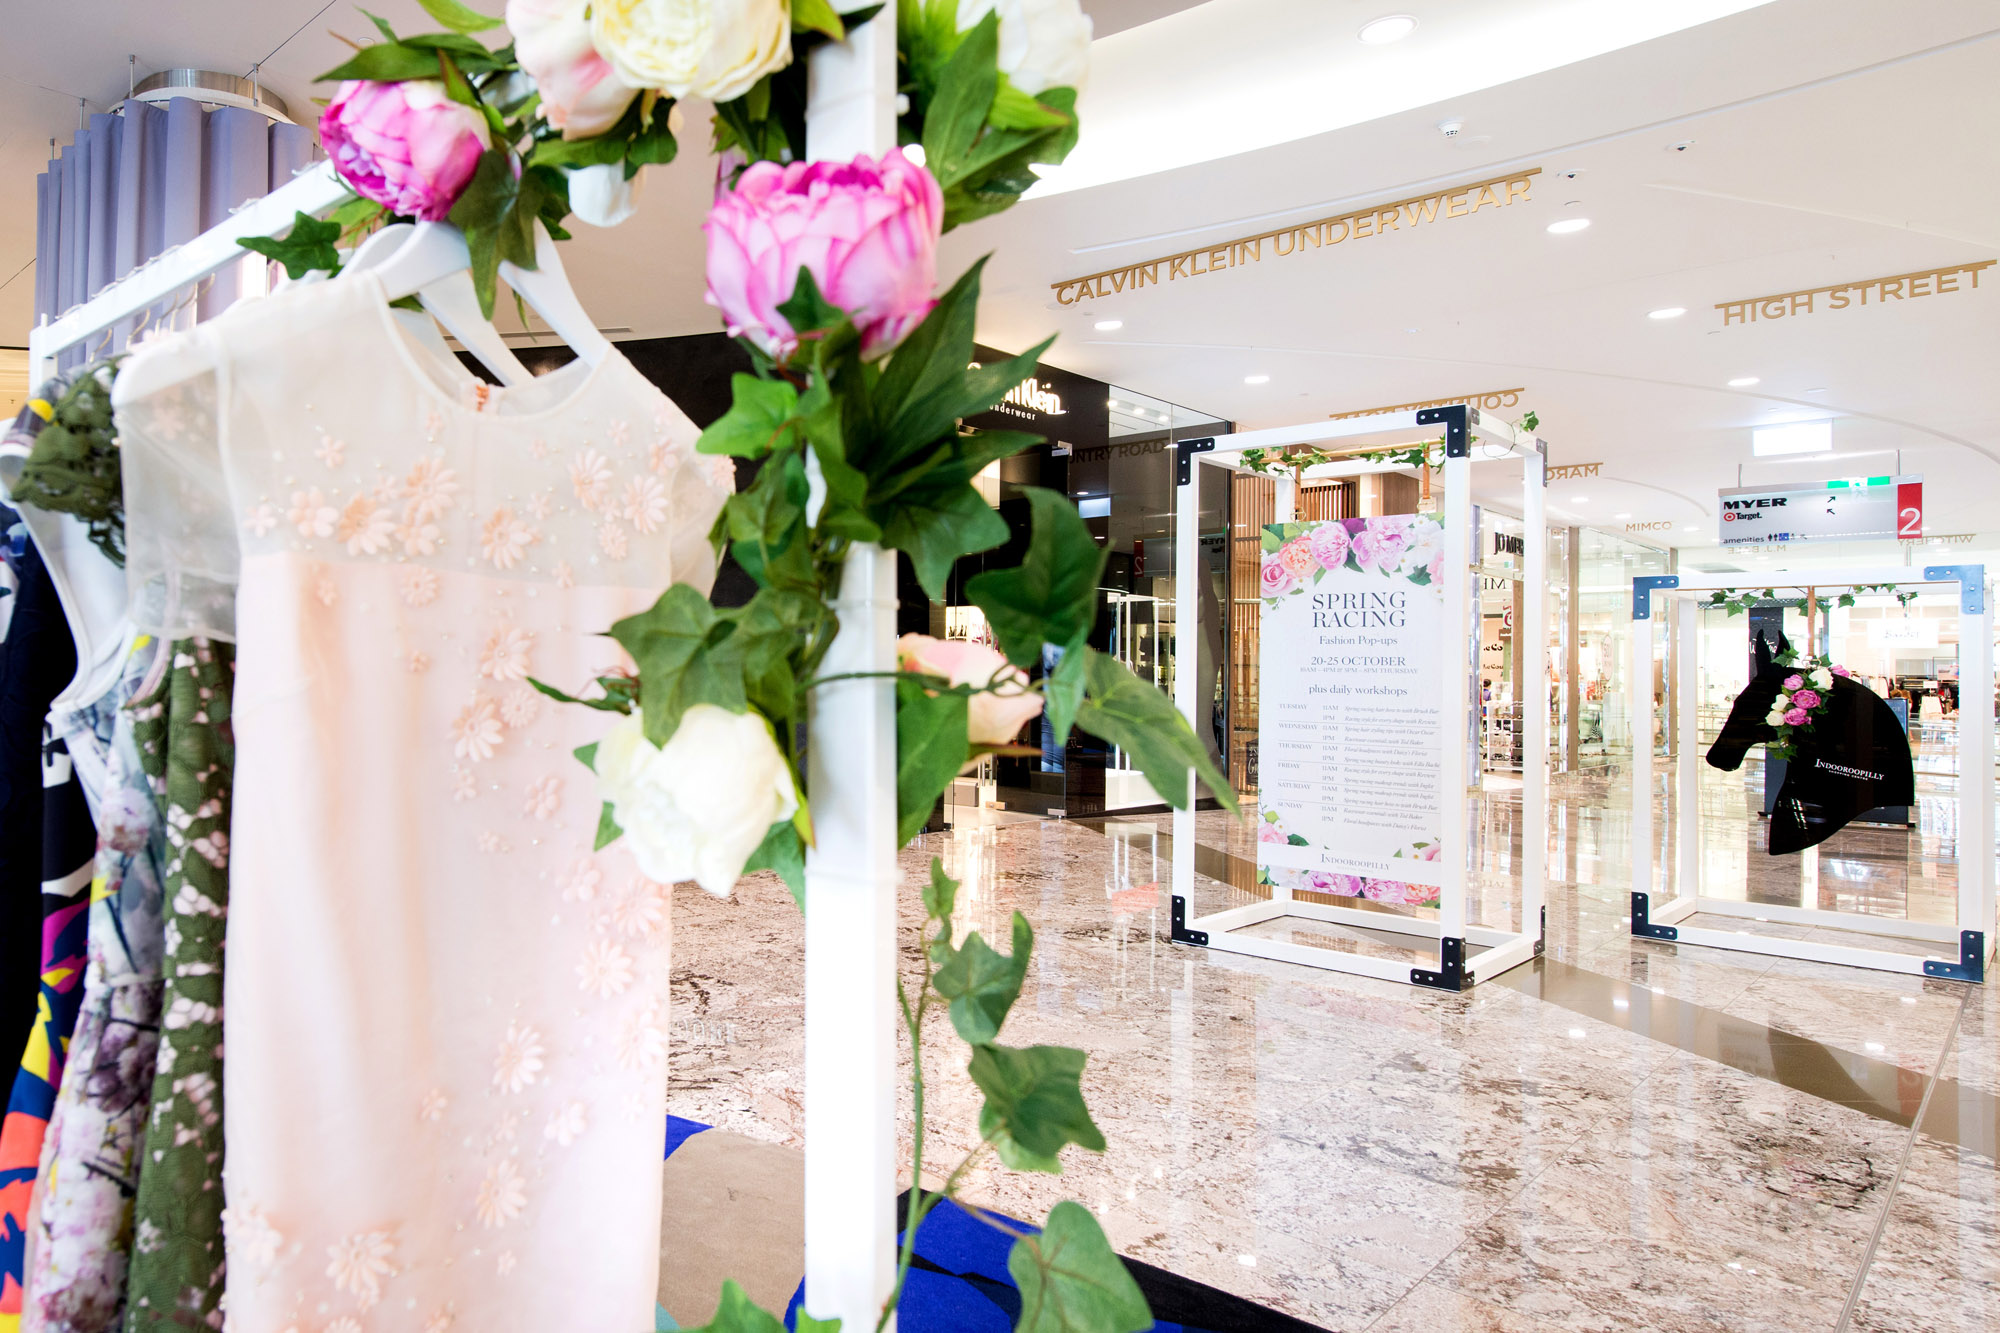 2015 TPH Spring Racing Fashion Pop Ups Indooroopilly 118